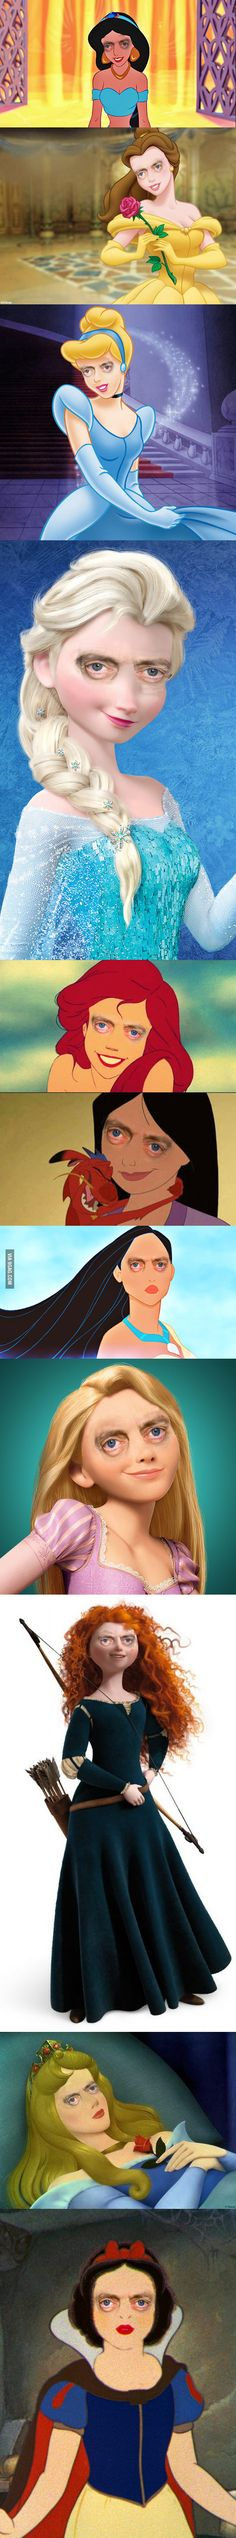 Disney Princesses with Steve Buscemi's Eyes - 9GAG